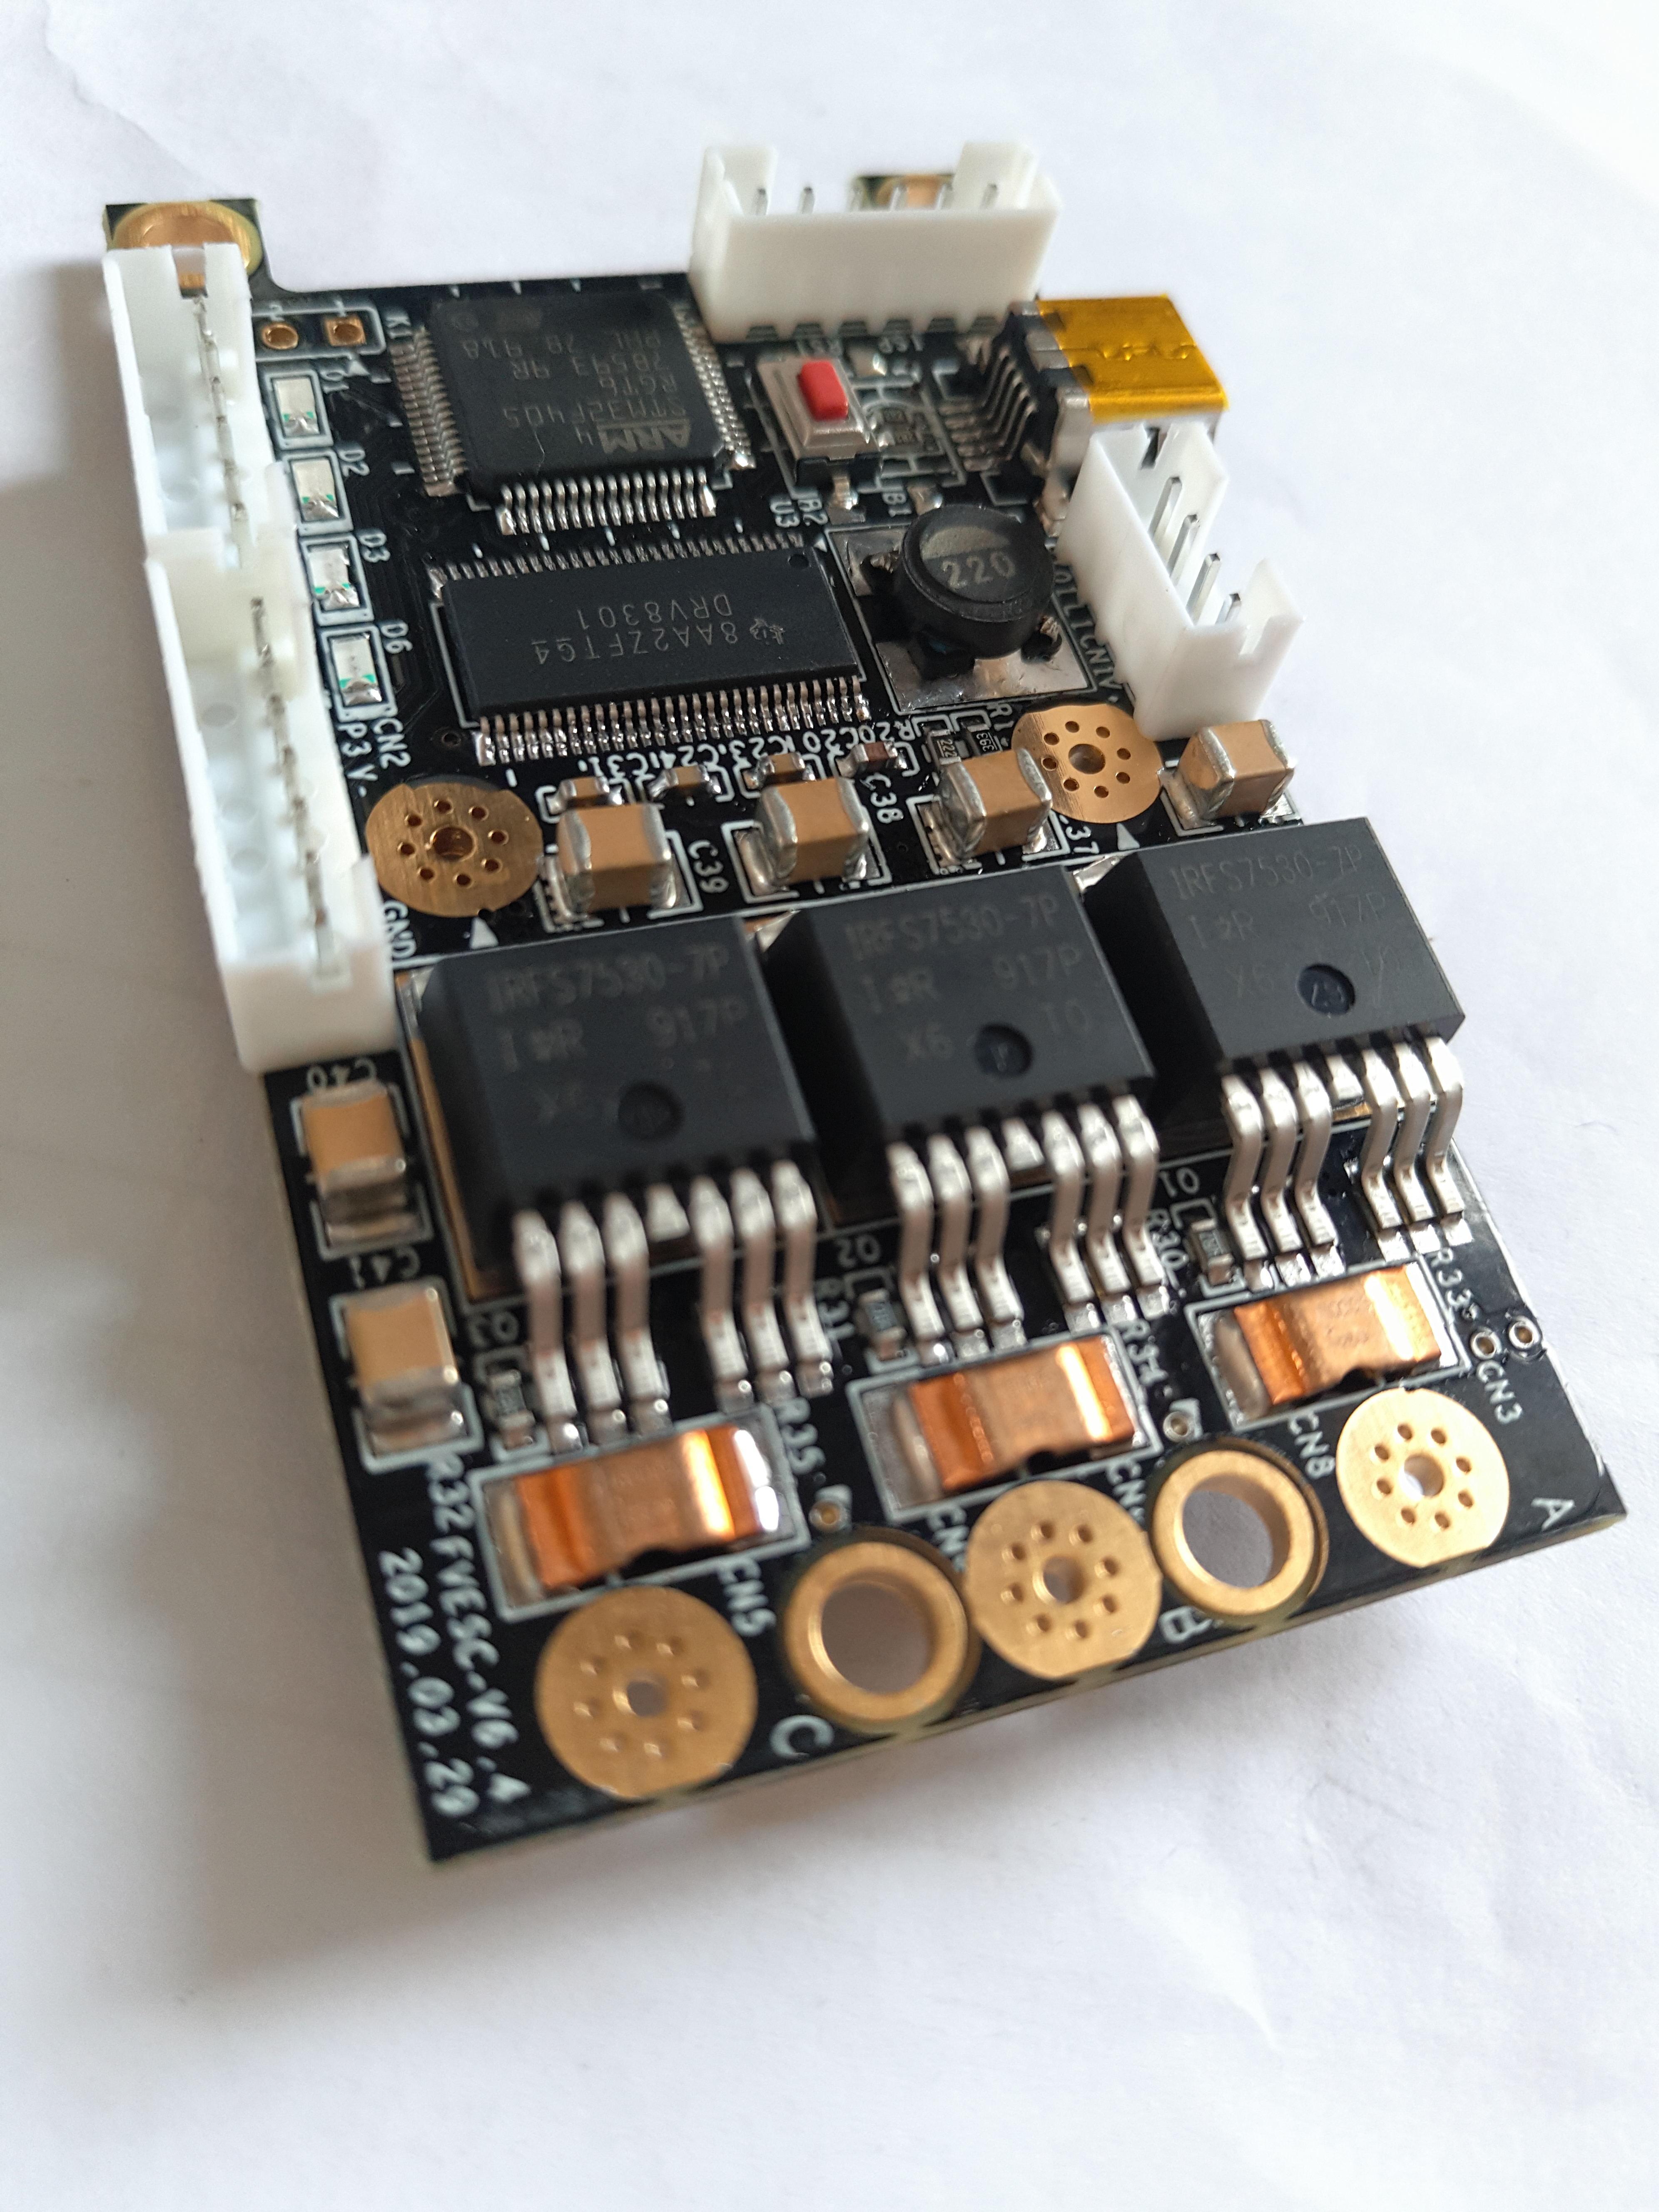 [Upgrade Version] VESC6 Hardware V4 Complete Replacement Same Size Interface DRV8301 ESC